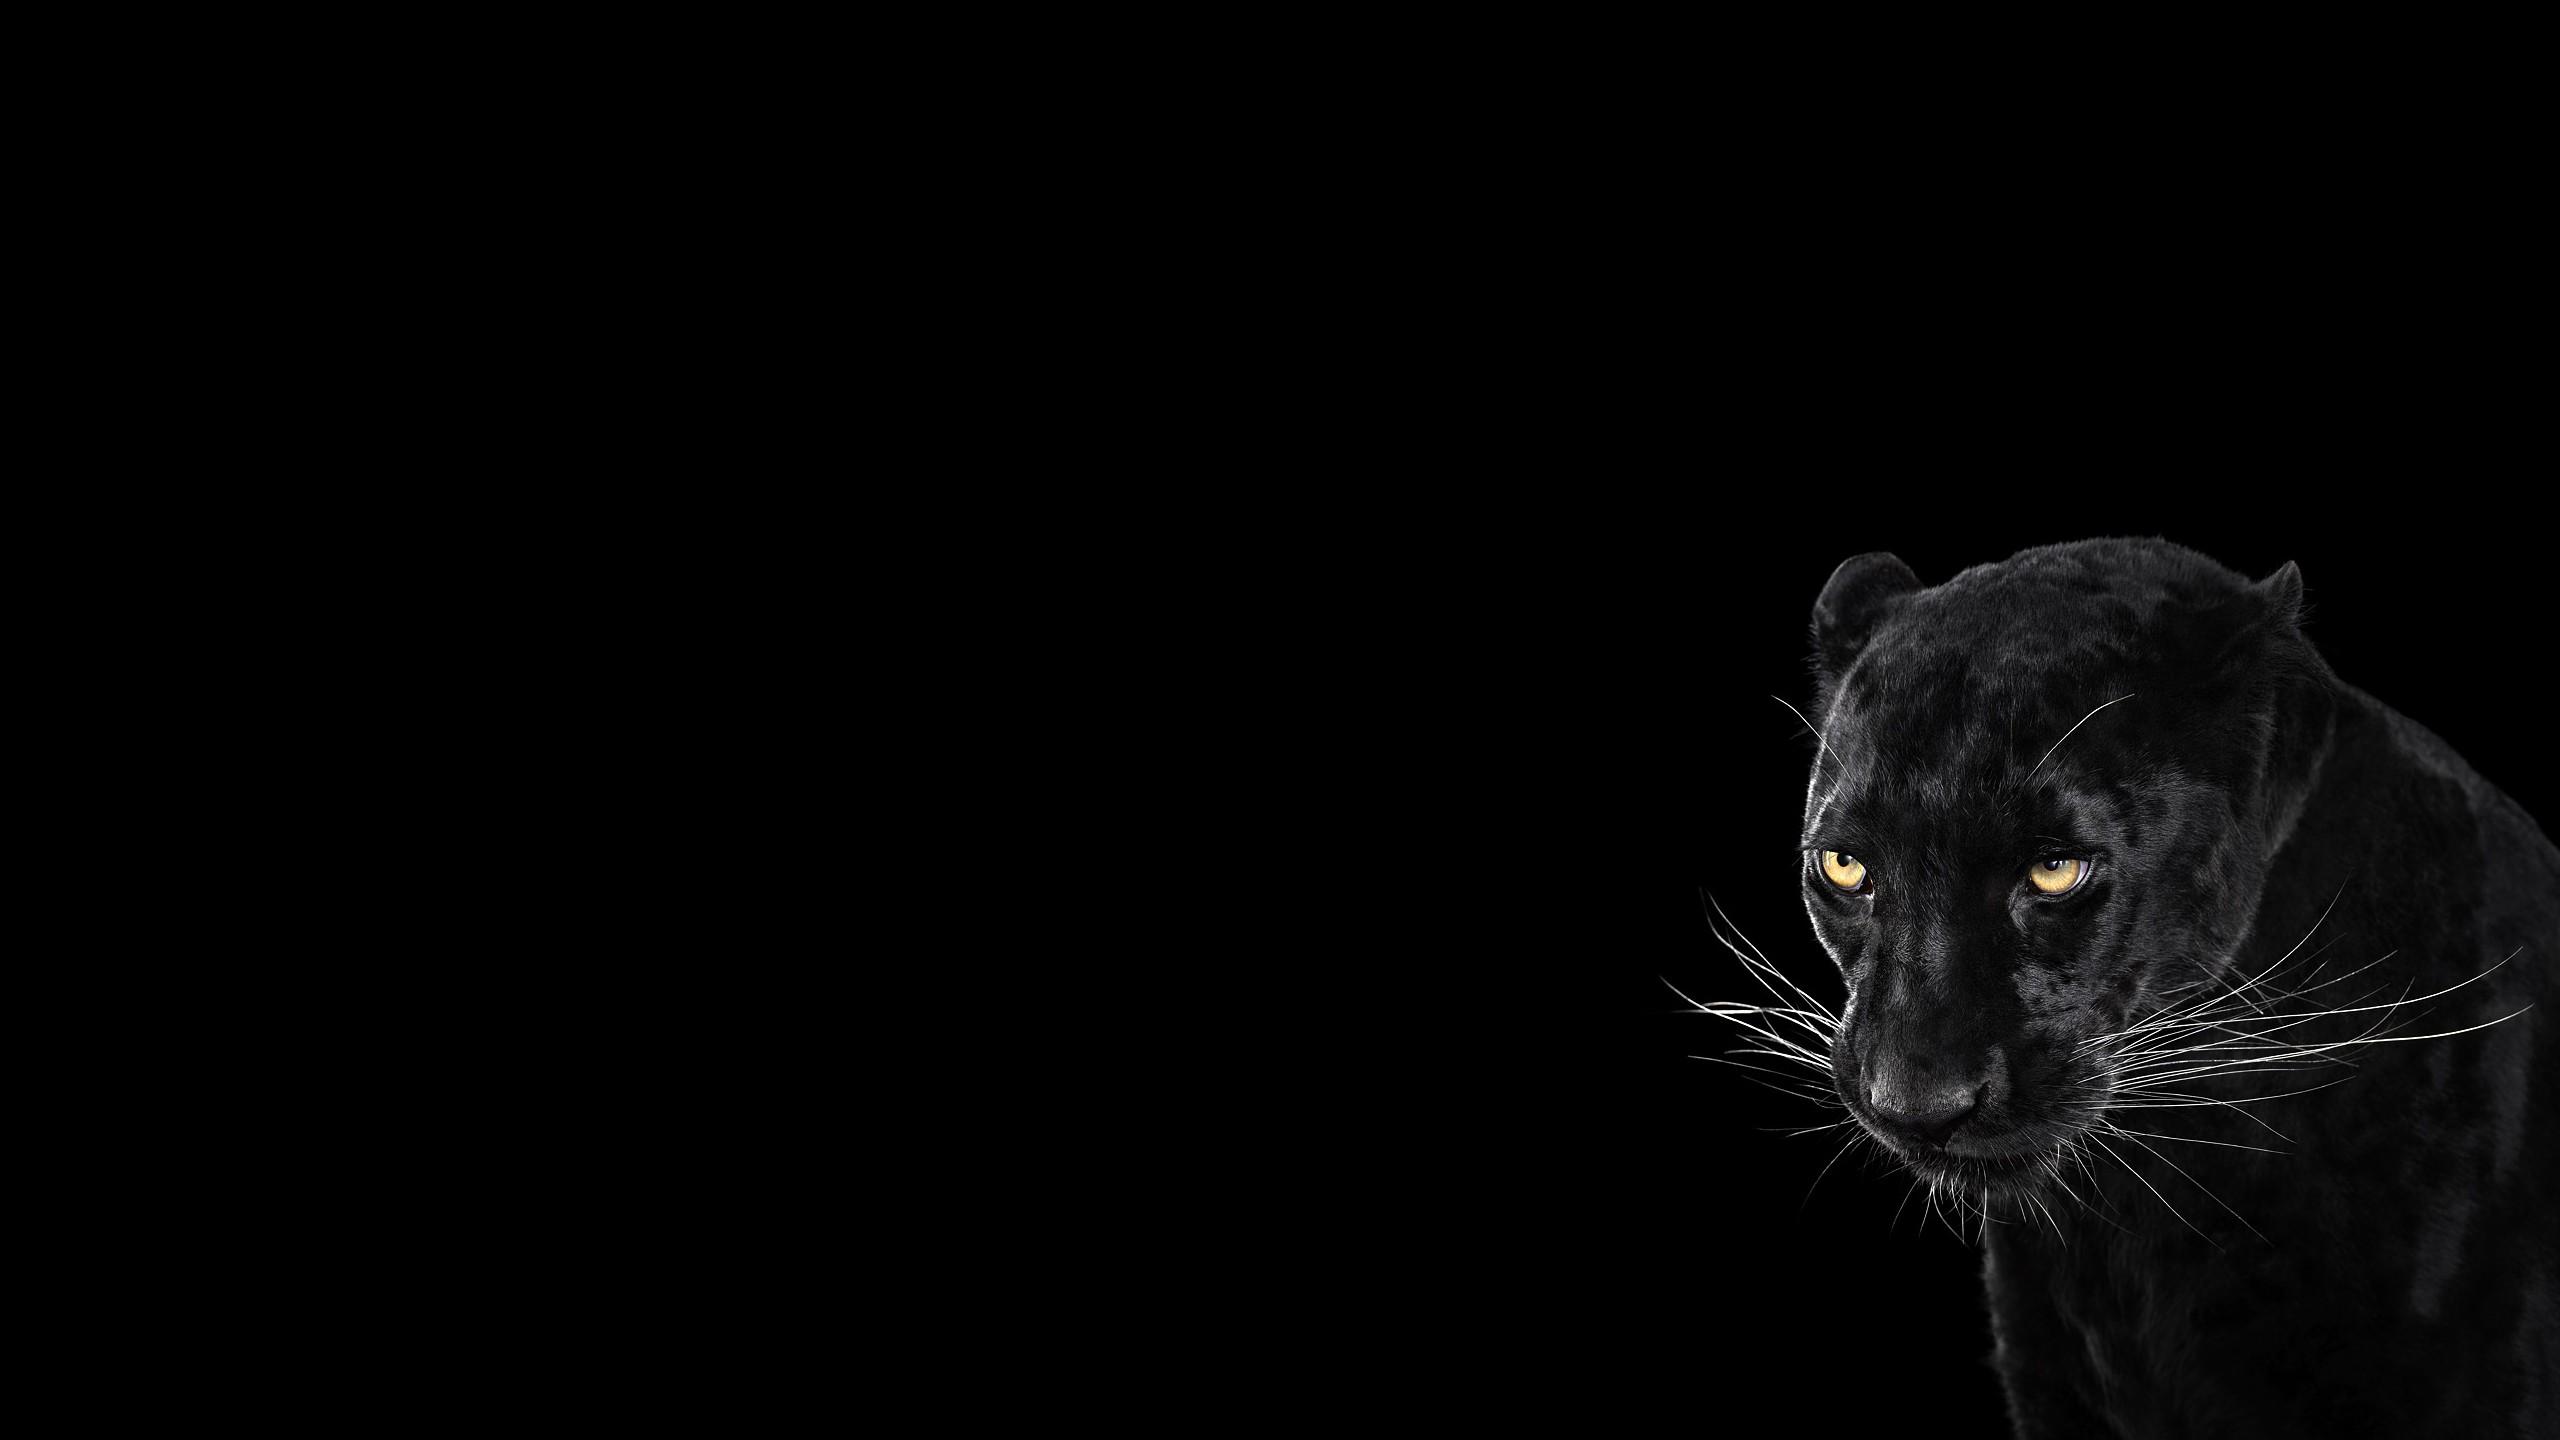 James Bond Iphone Wallpaper Panther Black Background Cool Animal Wallpaper